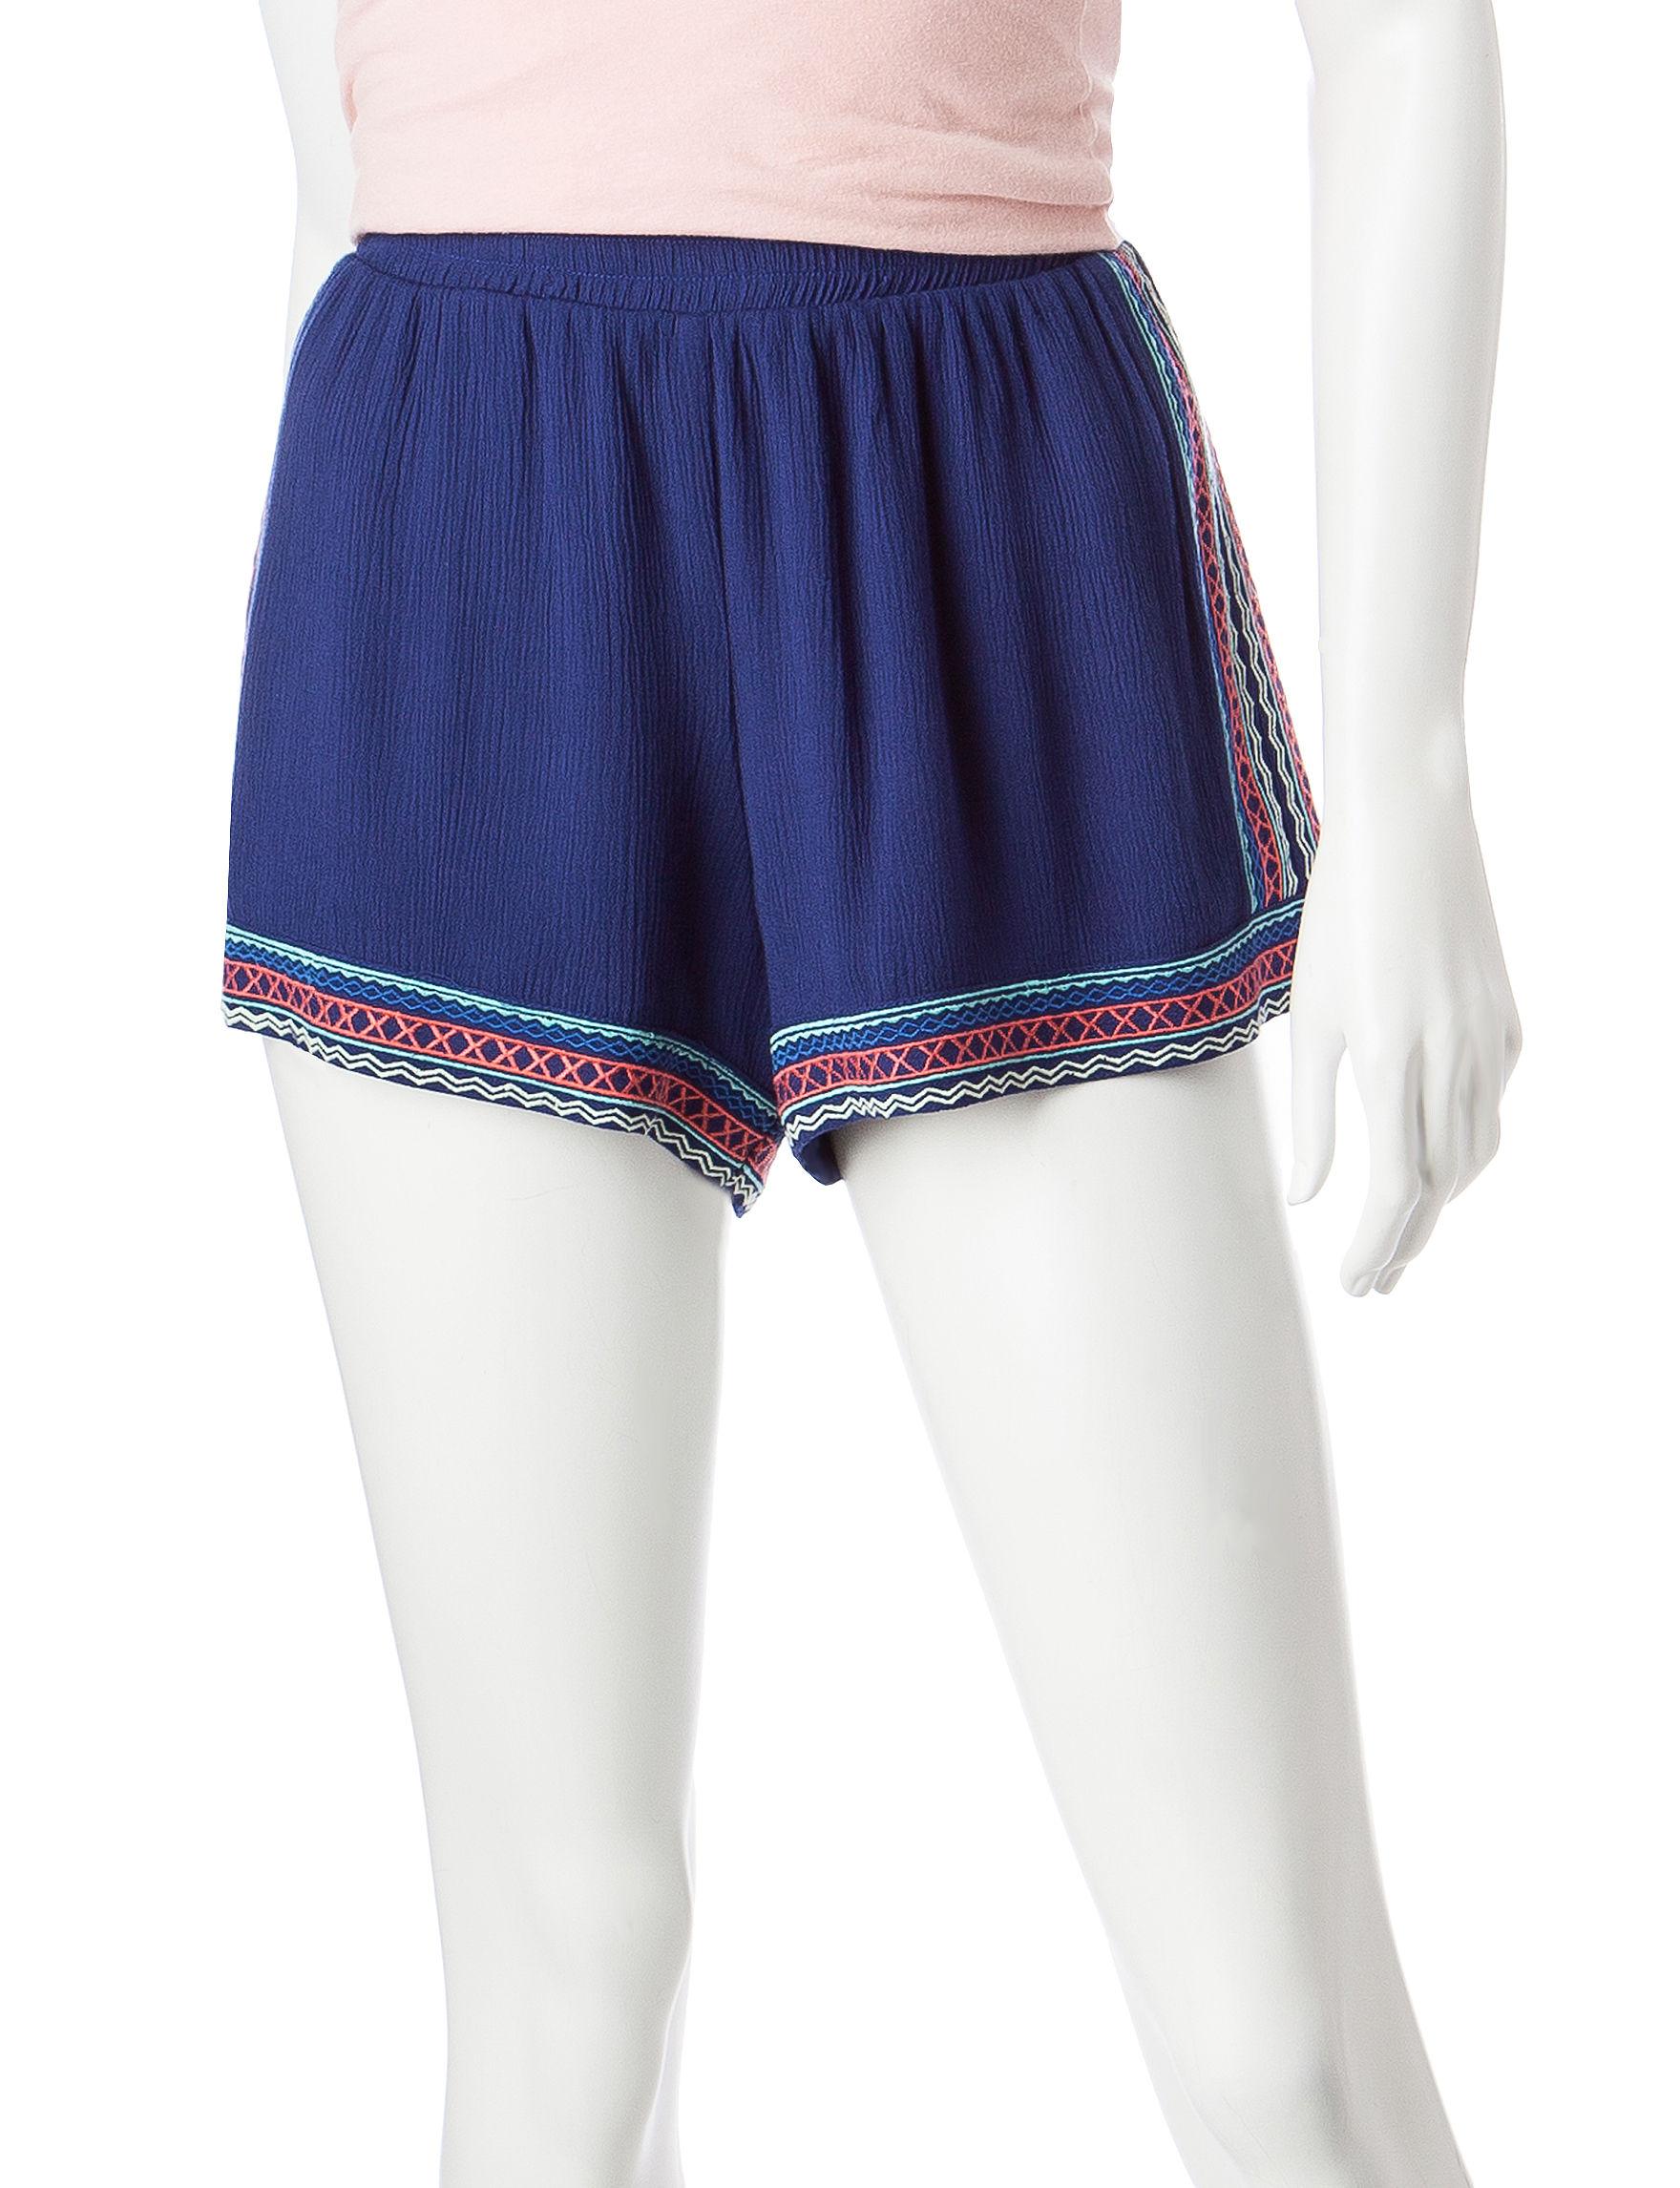 Justify Blue Soft Shorts